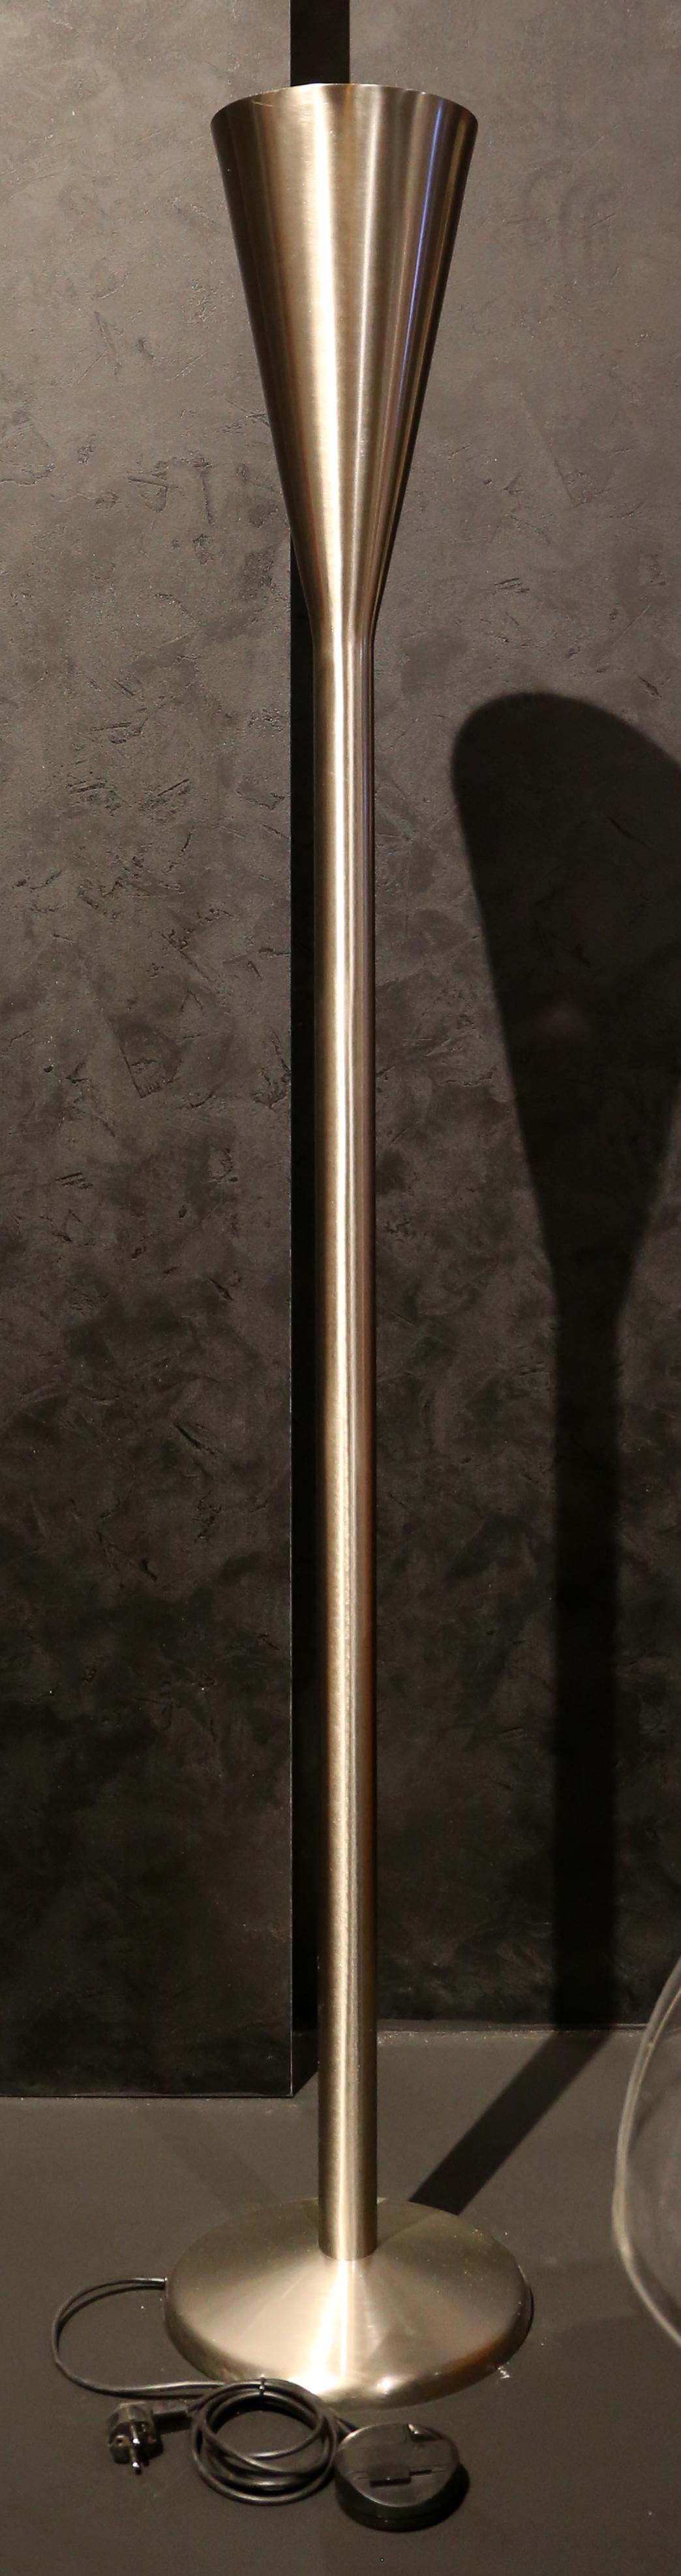 File:Pietro chiesa per fontana arte, lampada da terra luminator ...